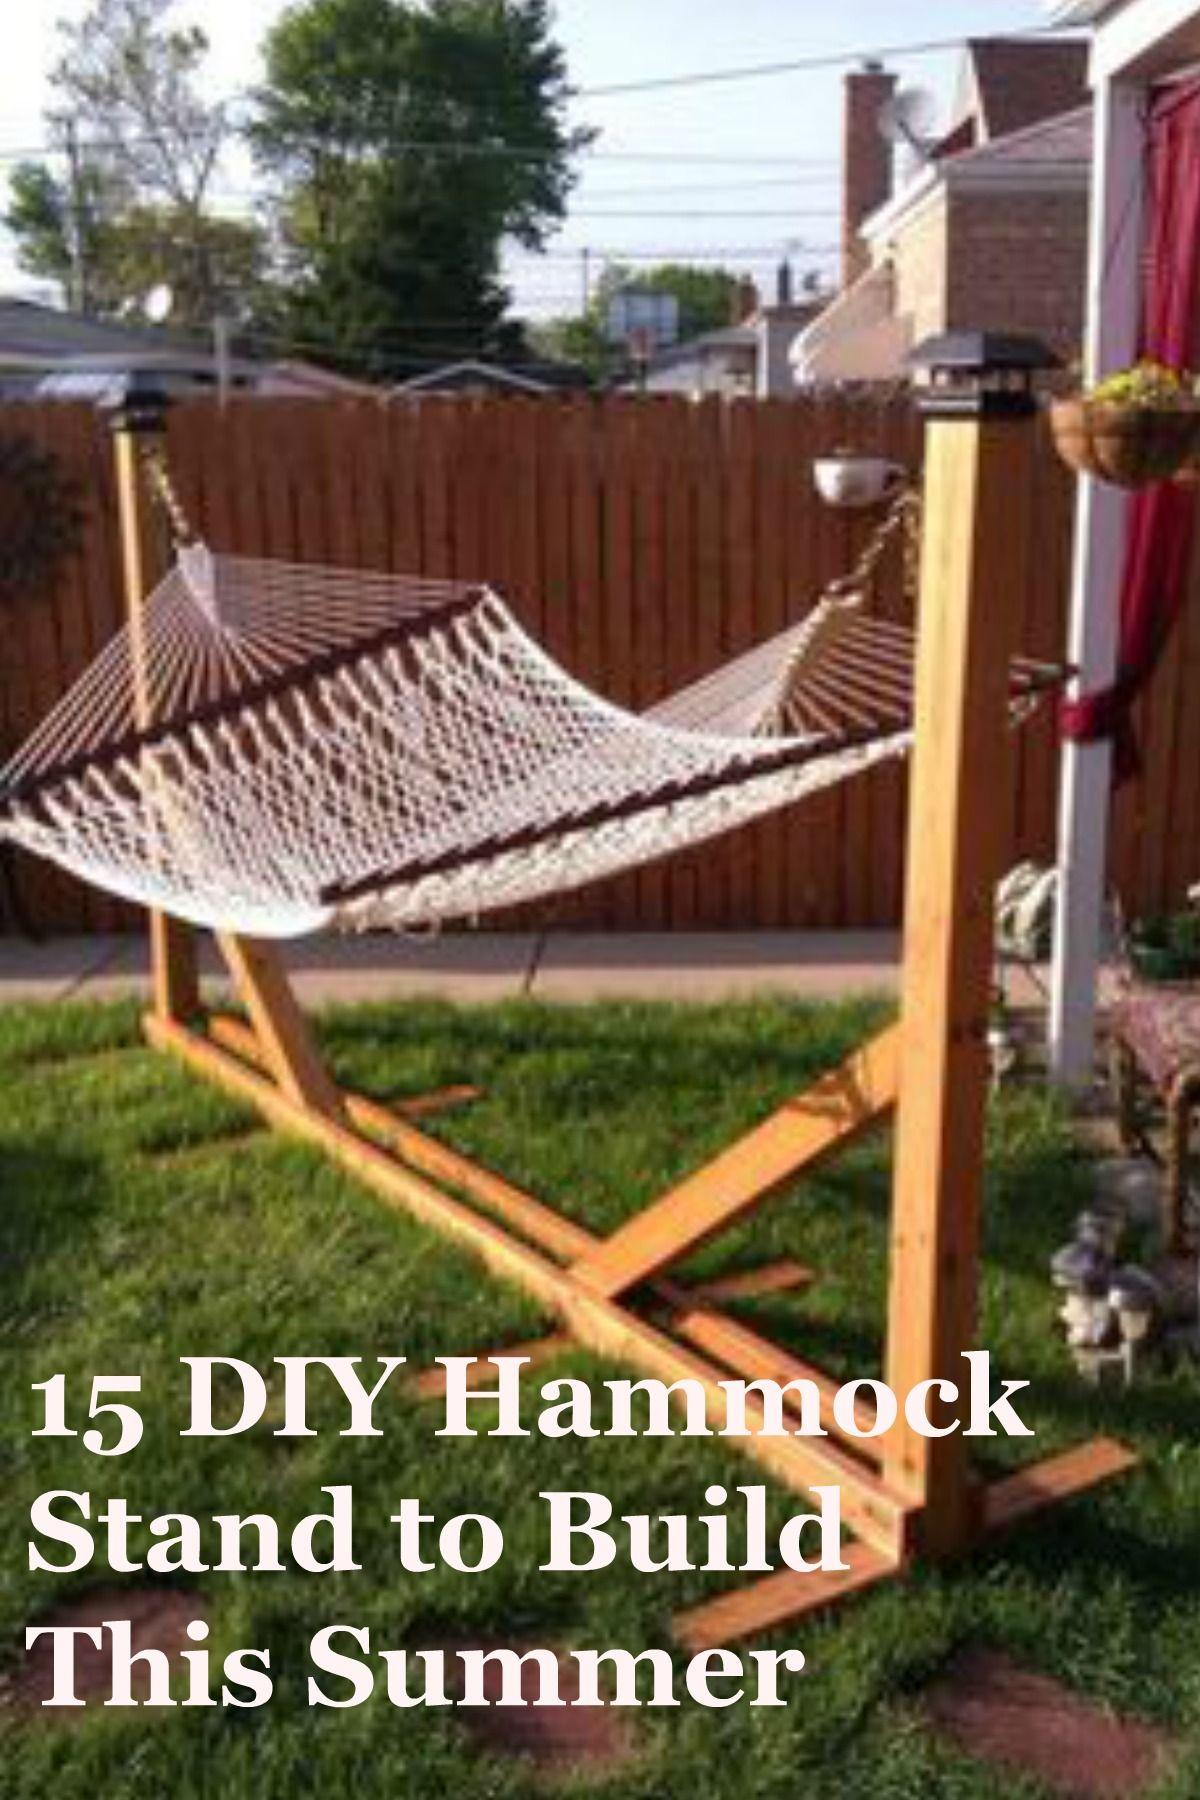 30 Diy Hammock Stand And Hammocks To Build This Summer